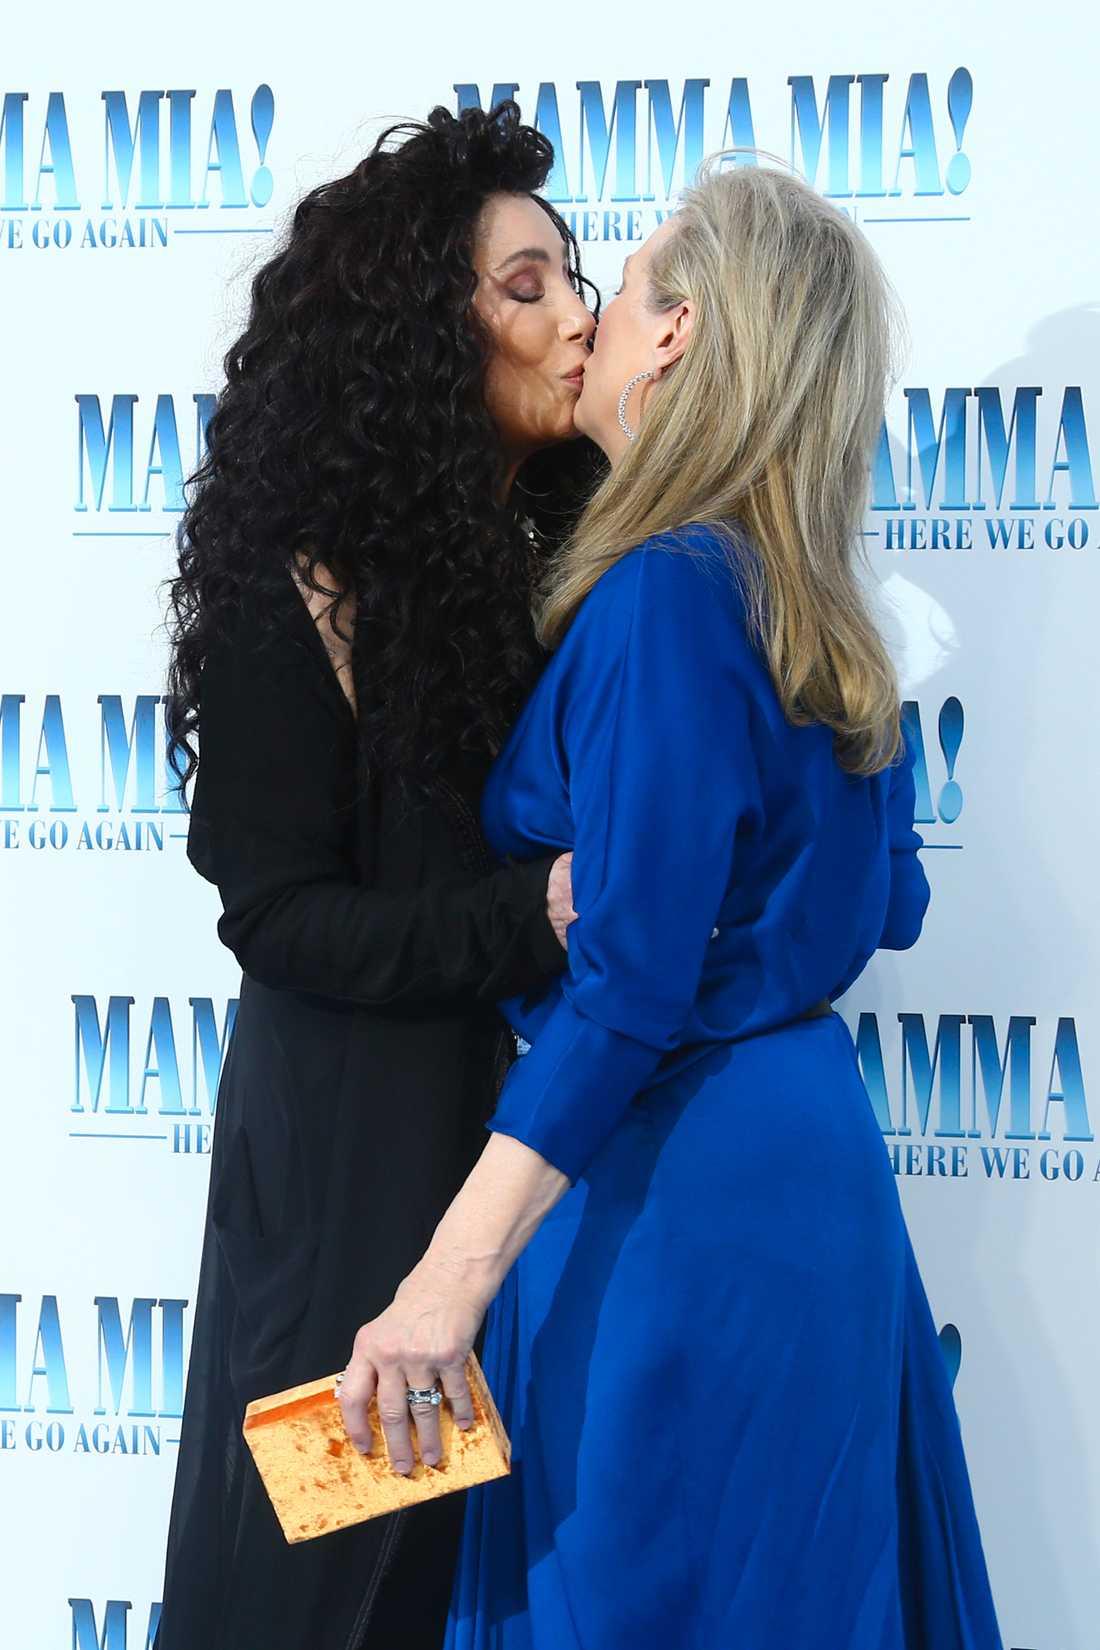 När Cher kysste Streep.